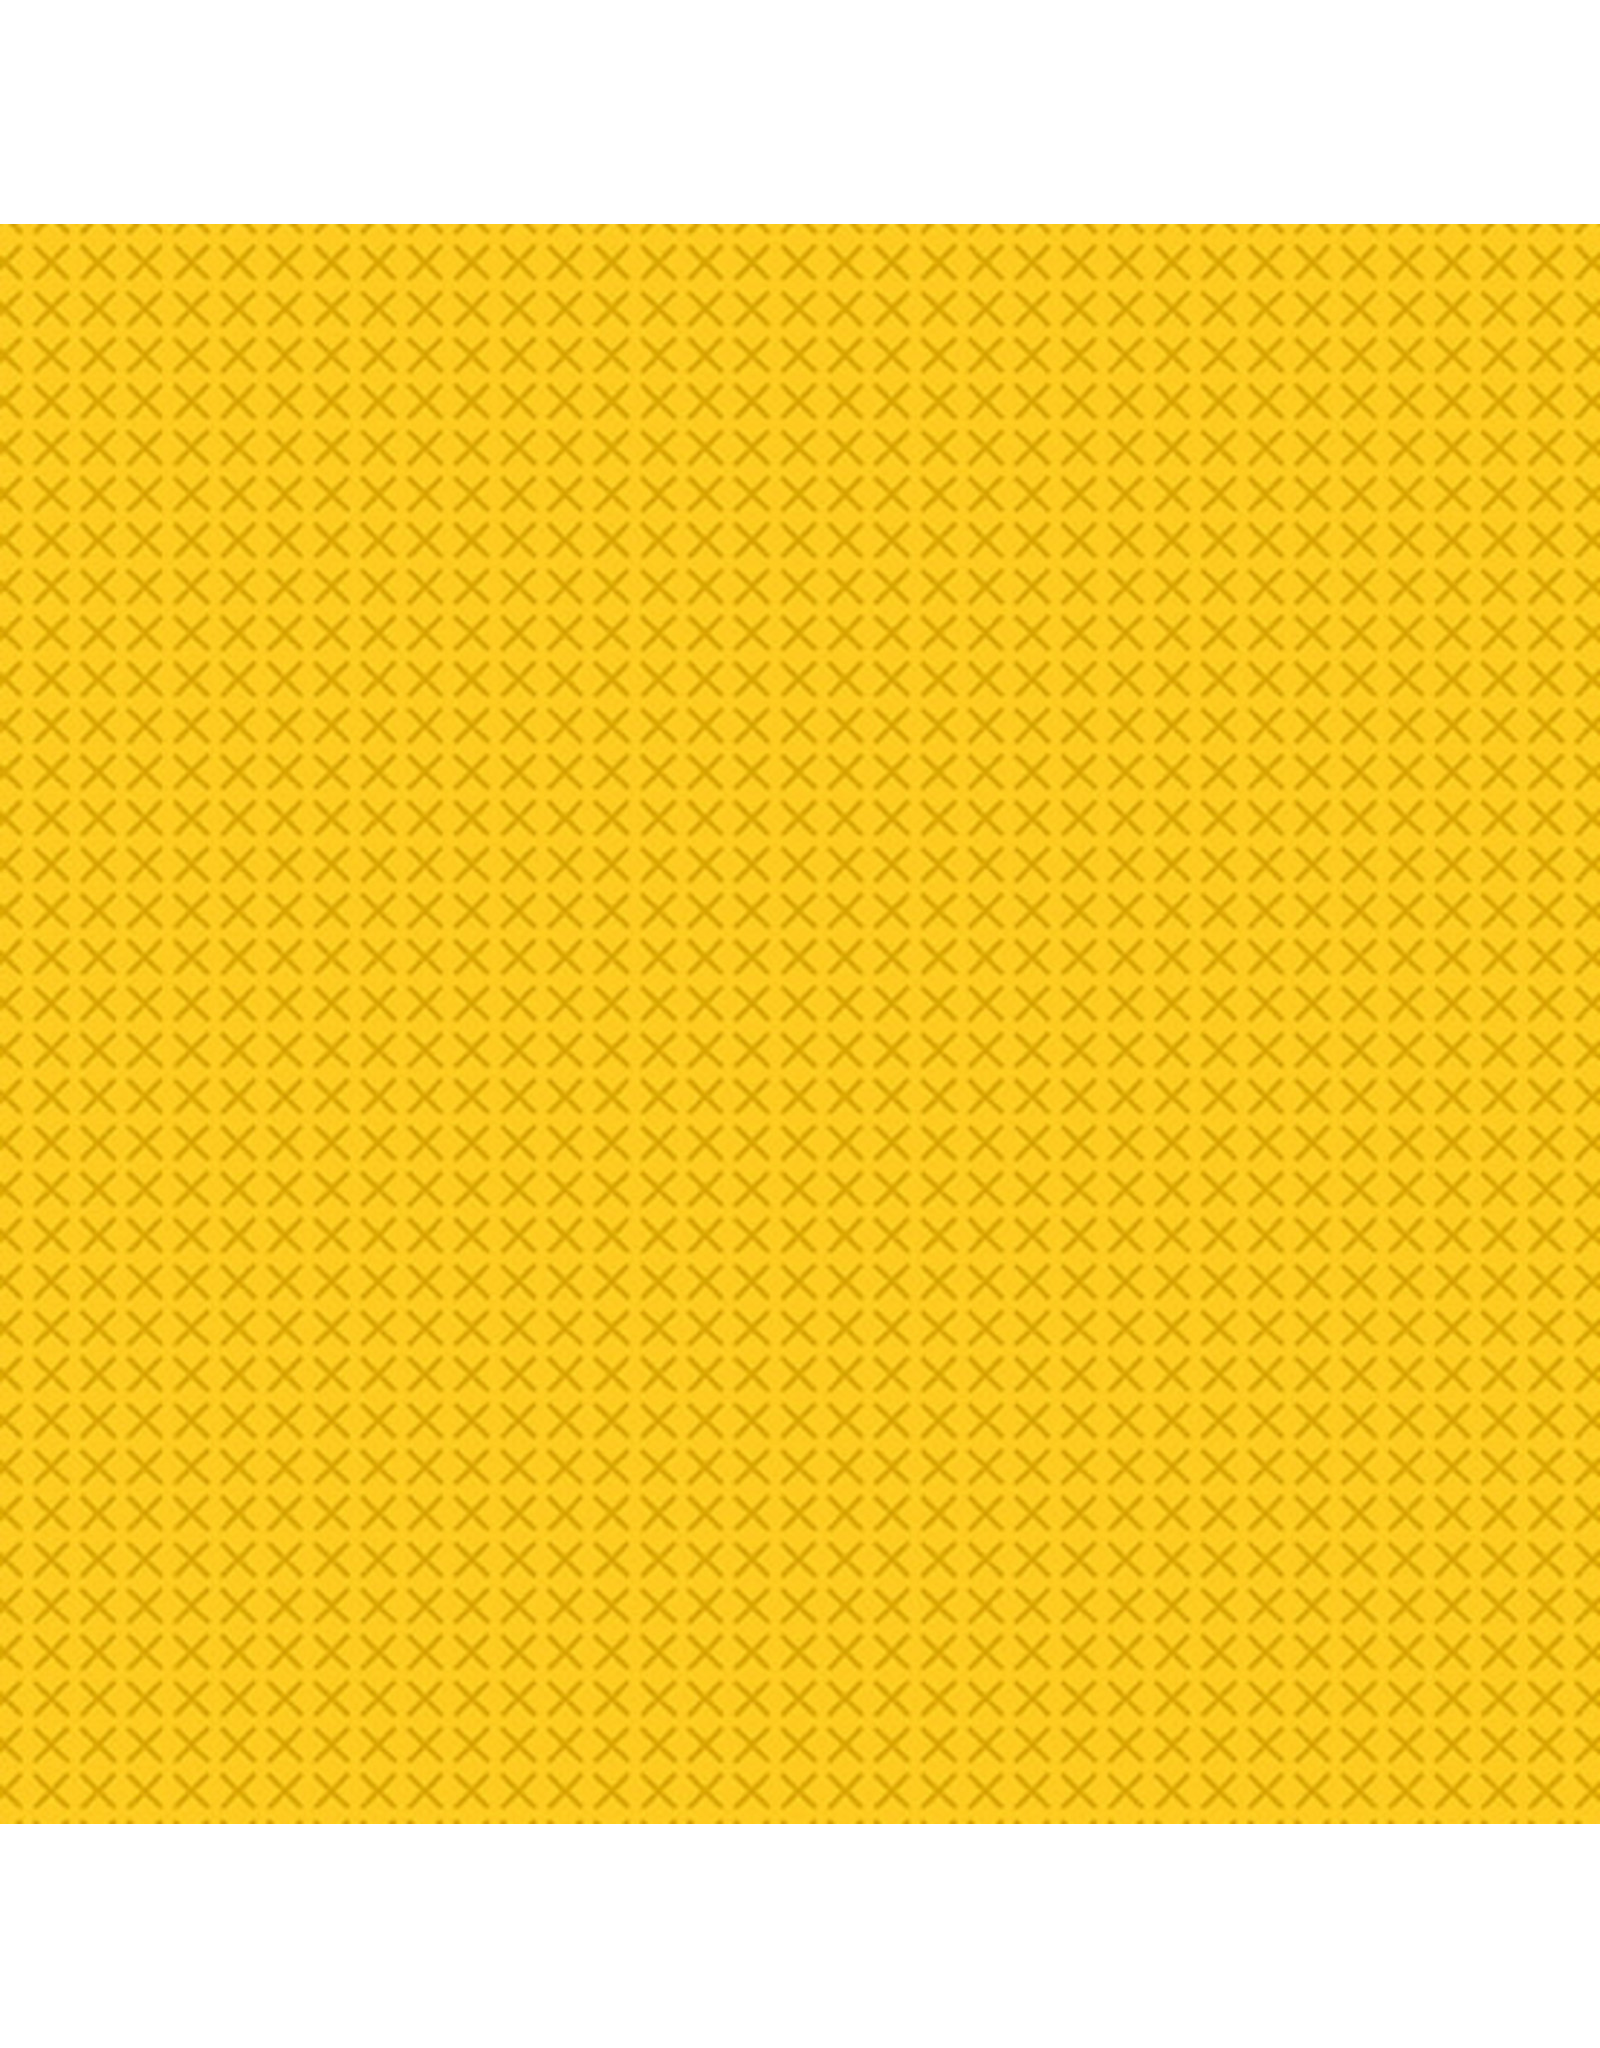 Andover Cross Stitch - Golden